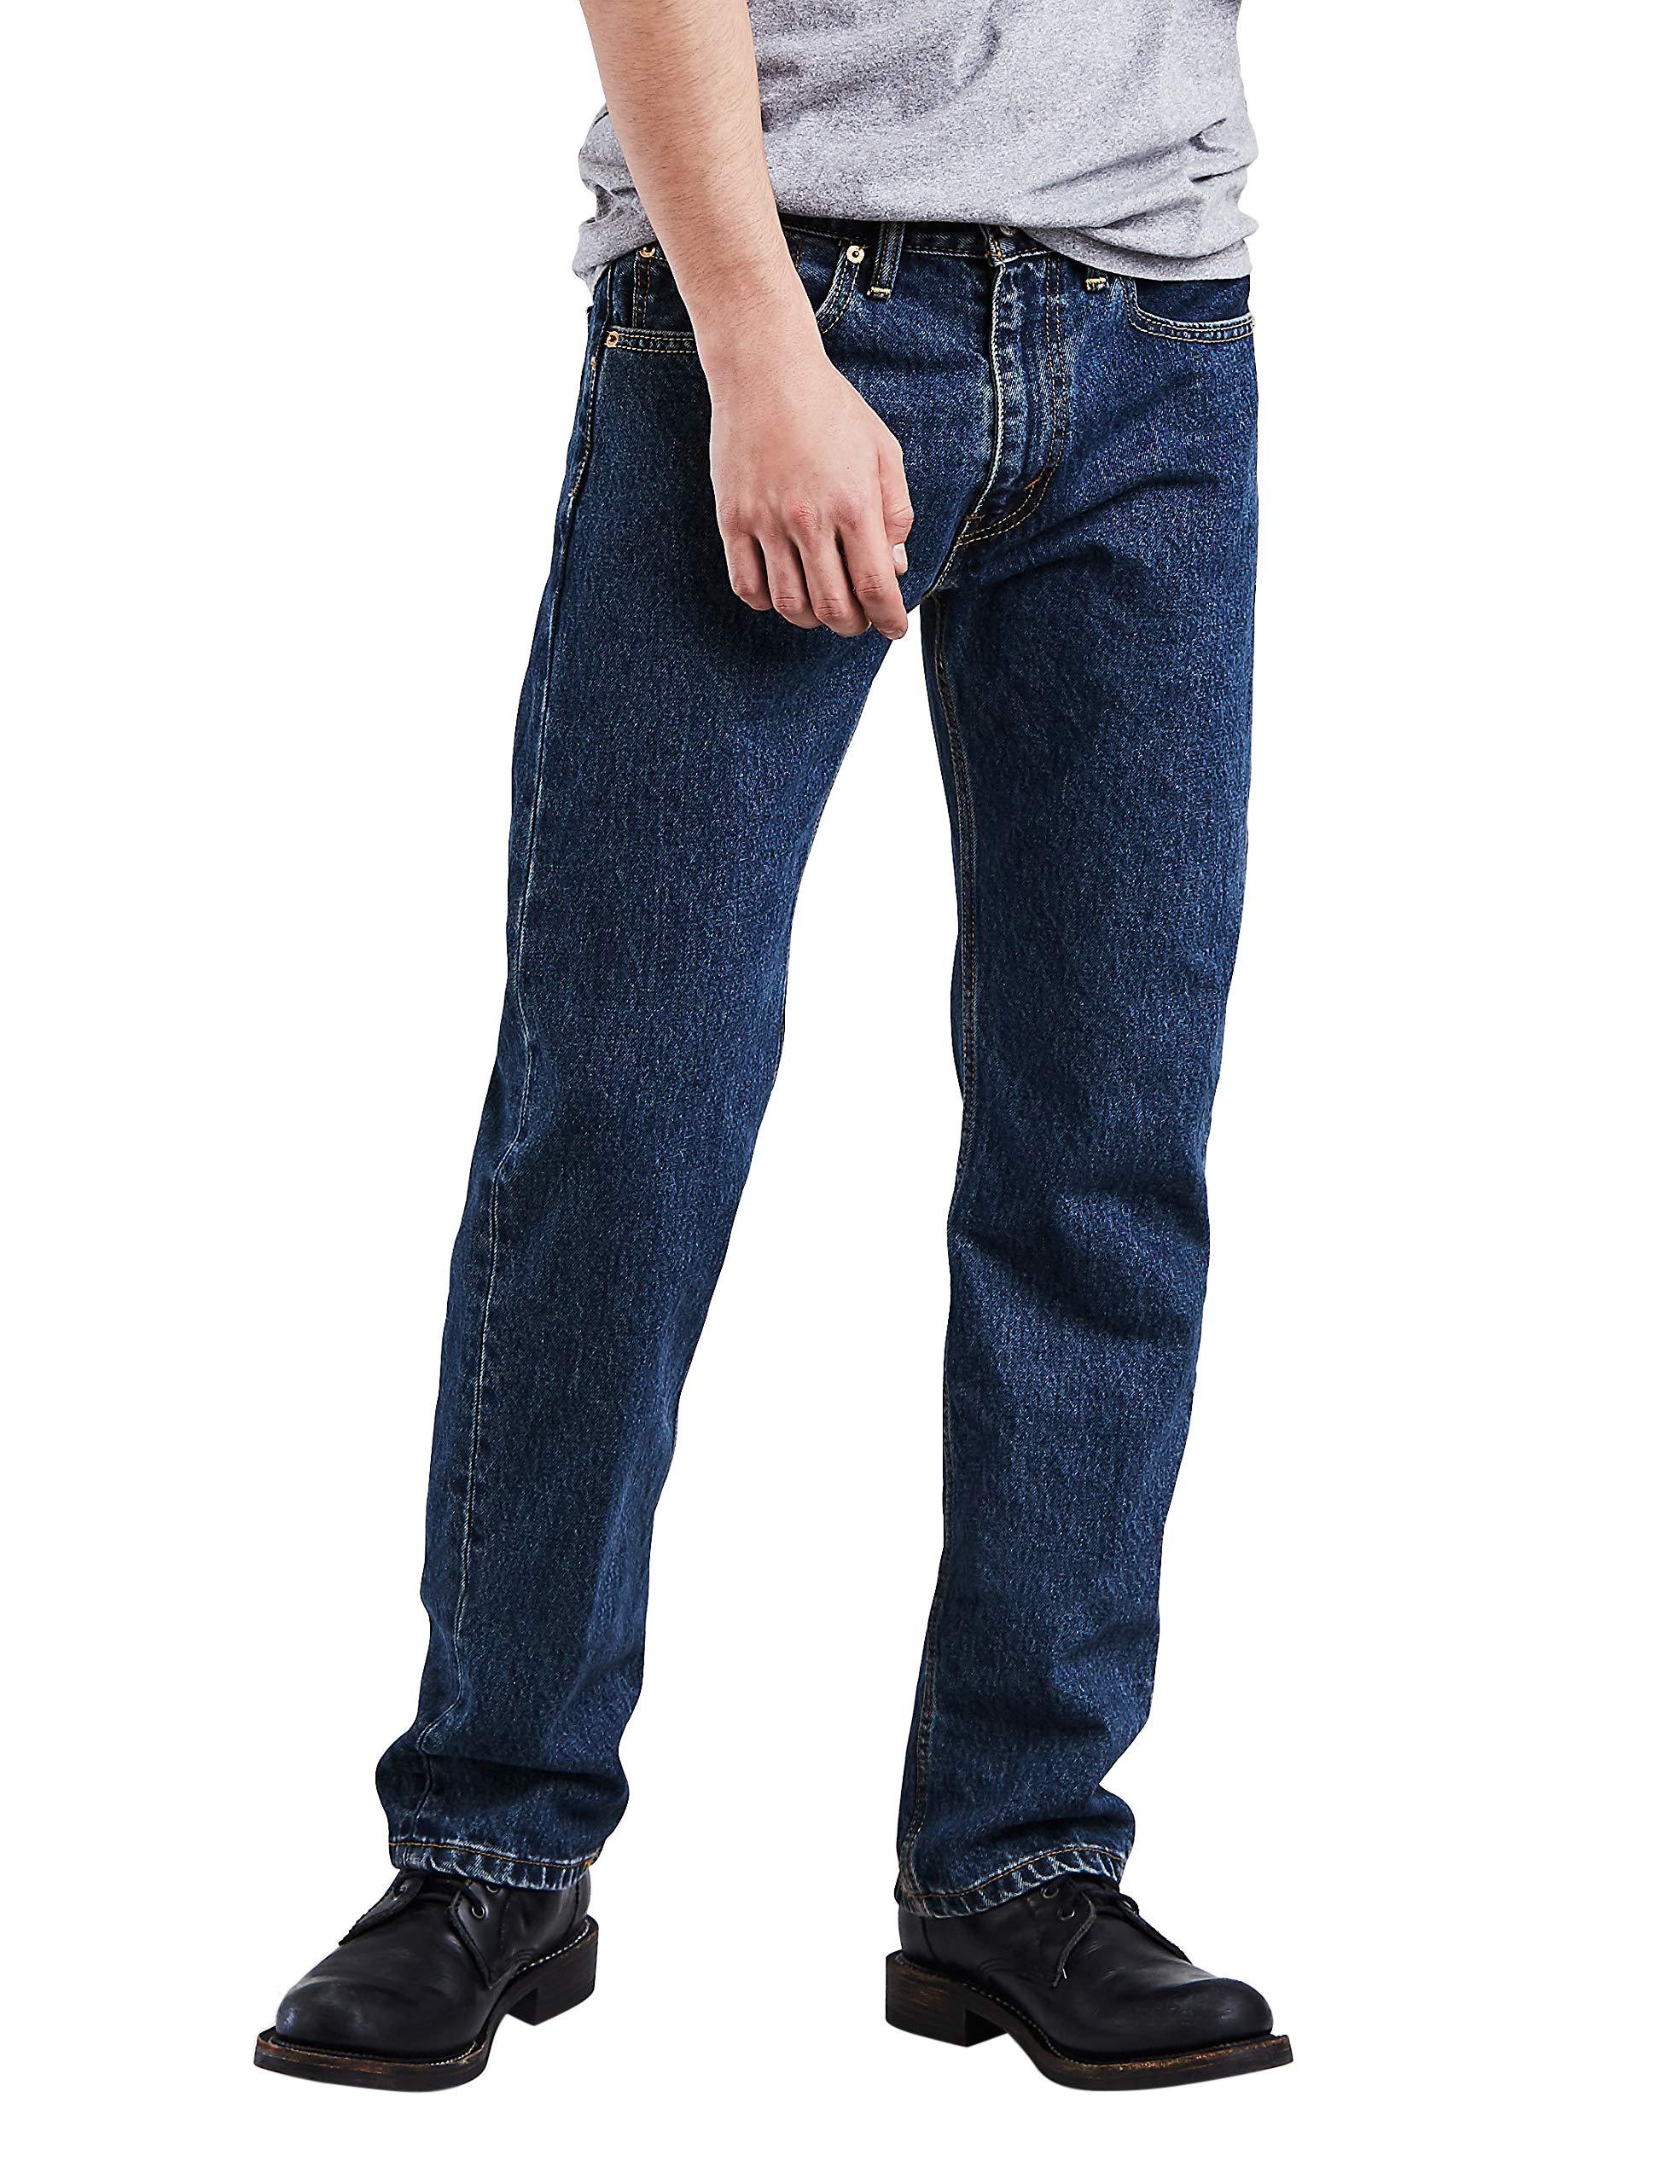 Levi's Men's 505 Regular Fit-Jeans, Dark Stonewash, 34x32 by Levi's